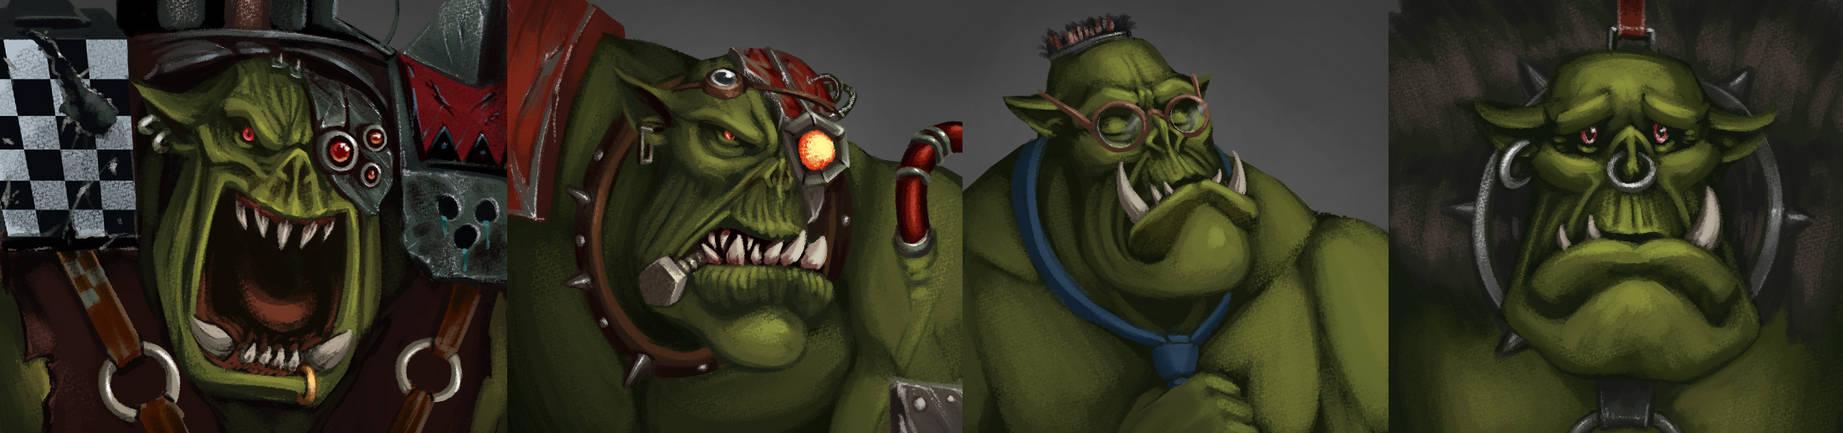 Ork portraits